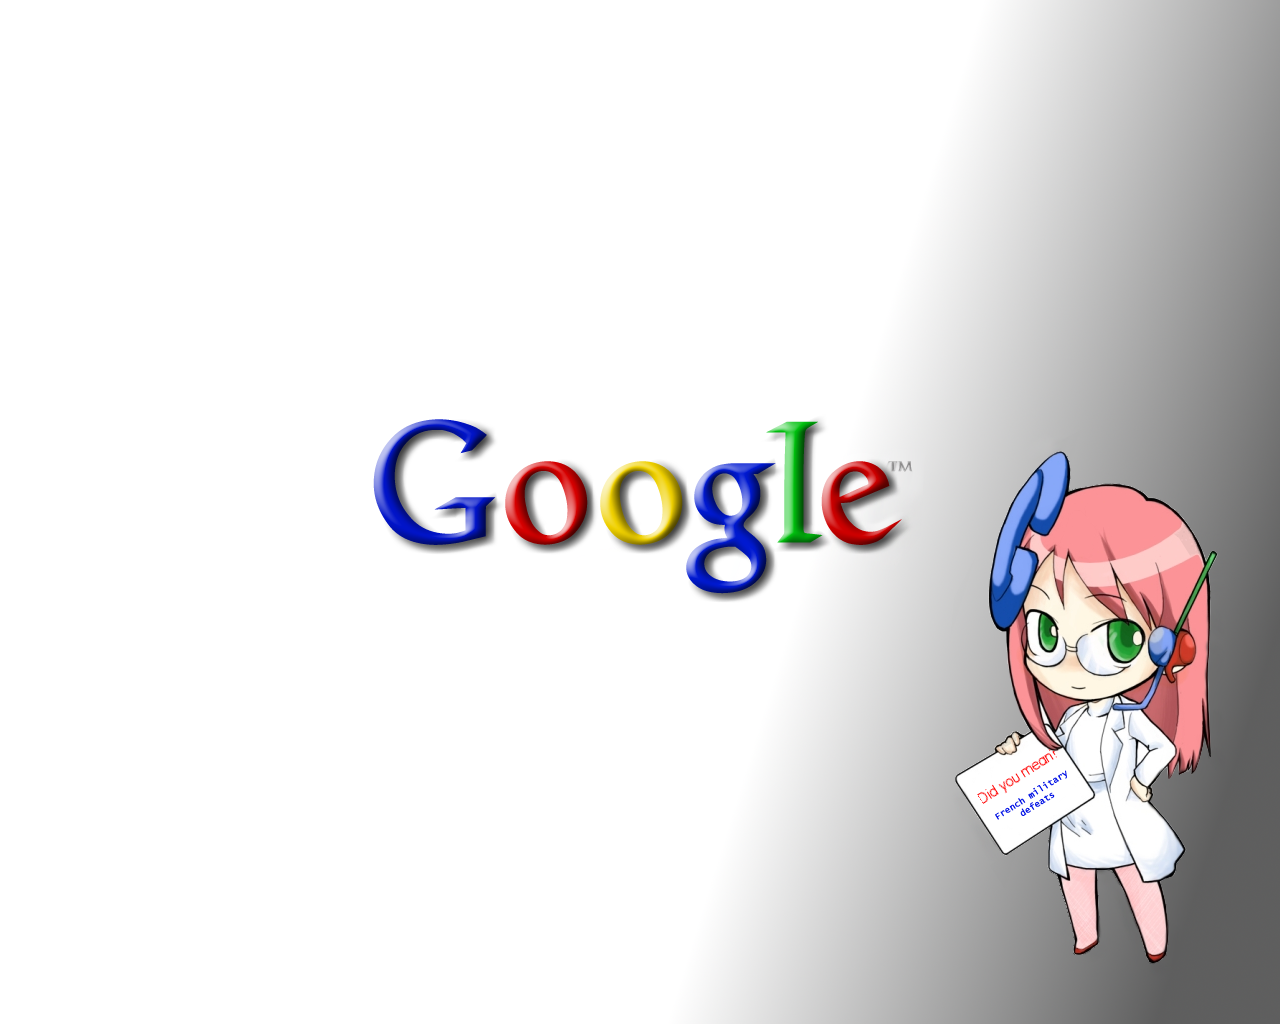 google anime girlpng 1280x1024